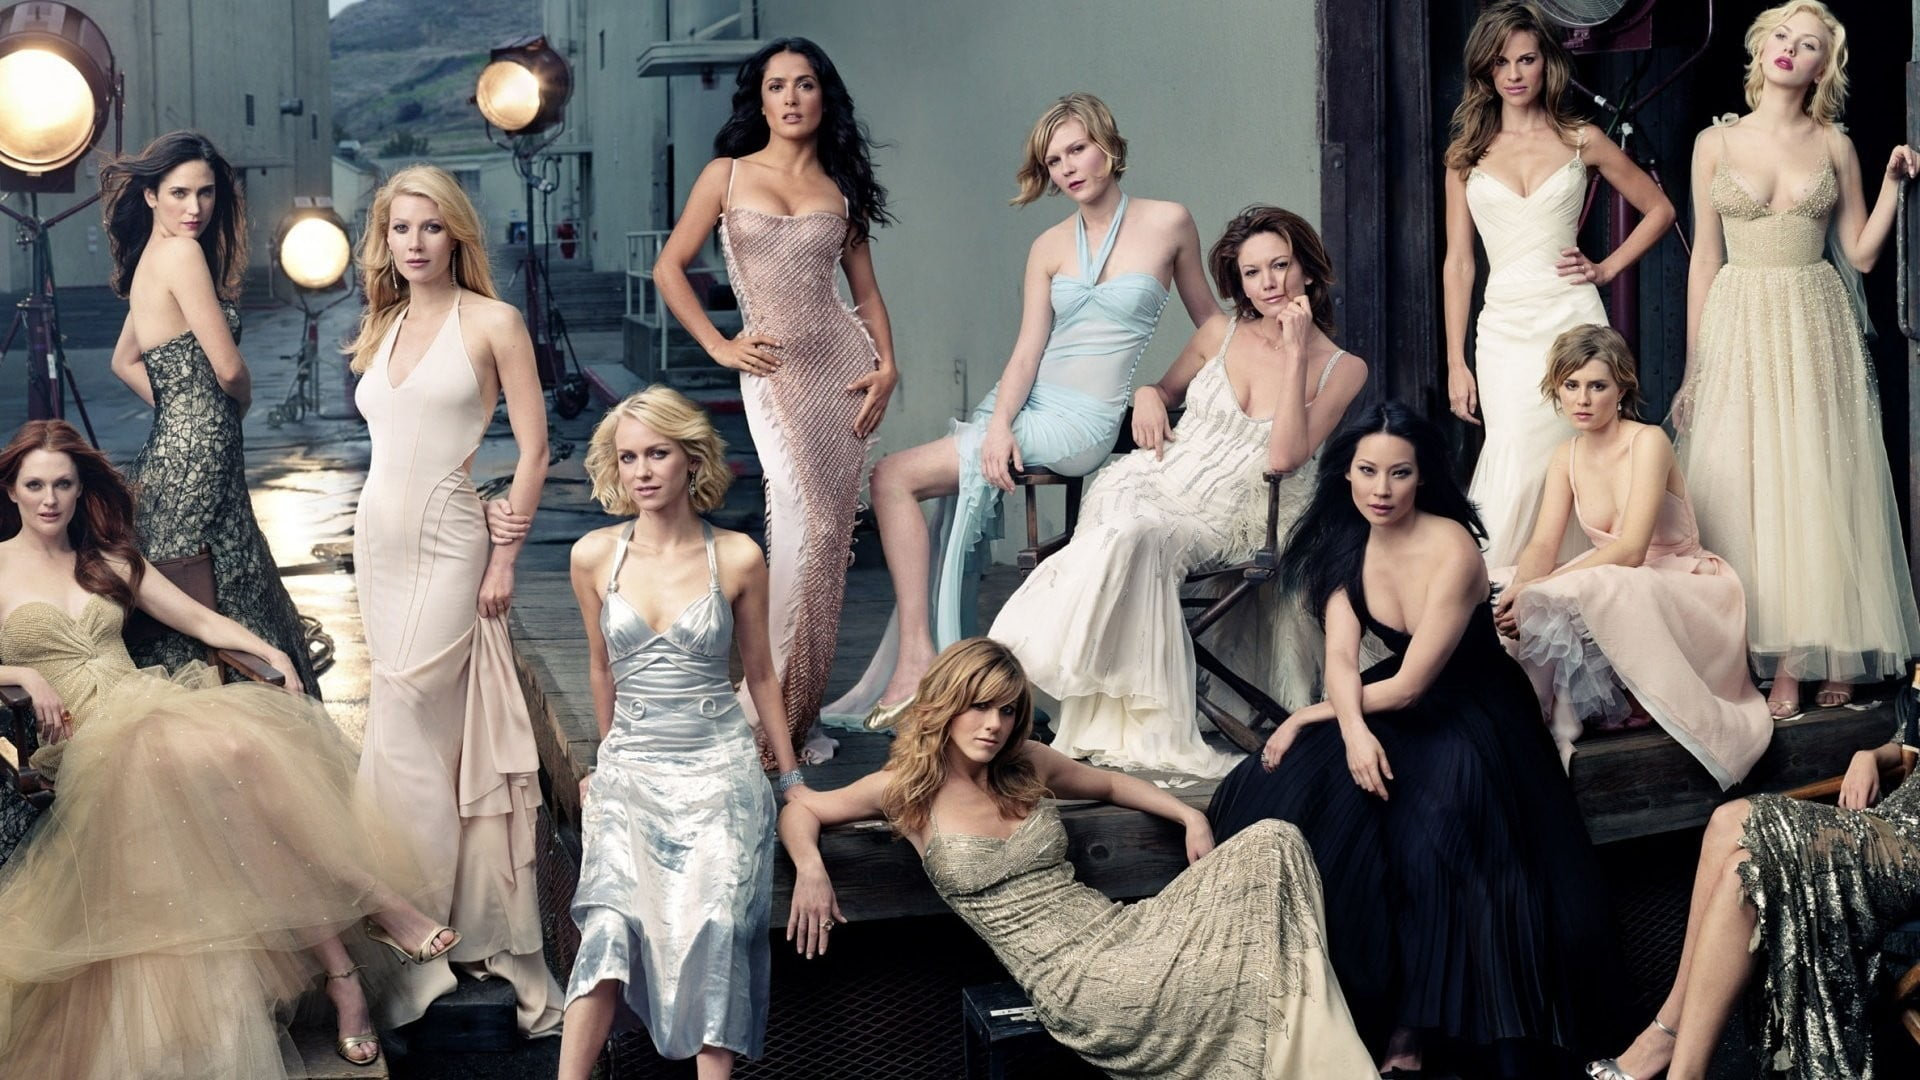 Women actress Jennifer Aniston Salma Hayek HD wallpaper 1920x1080